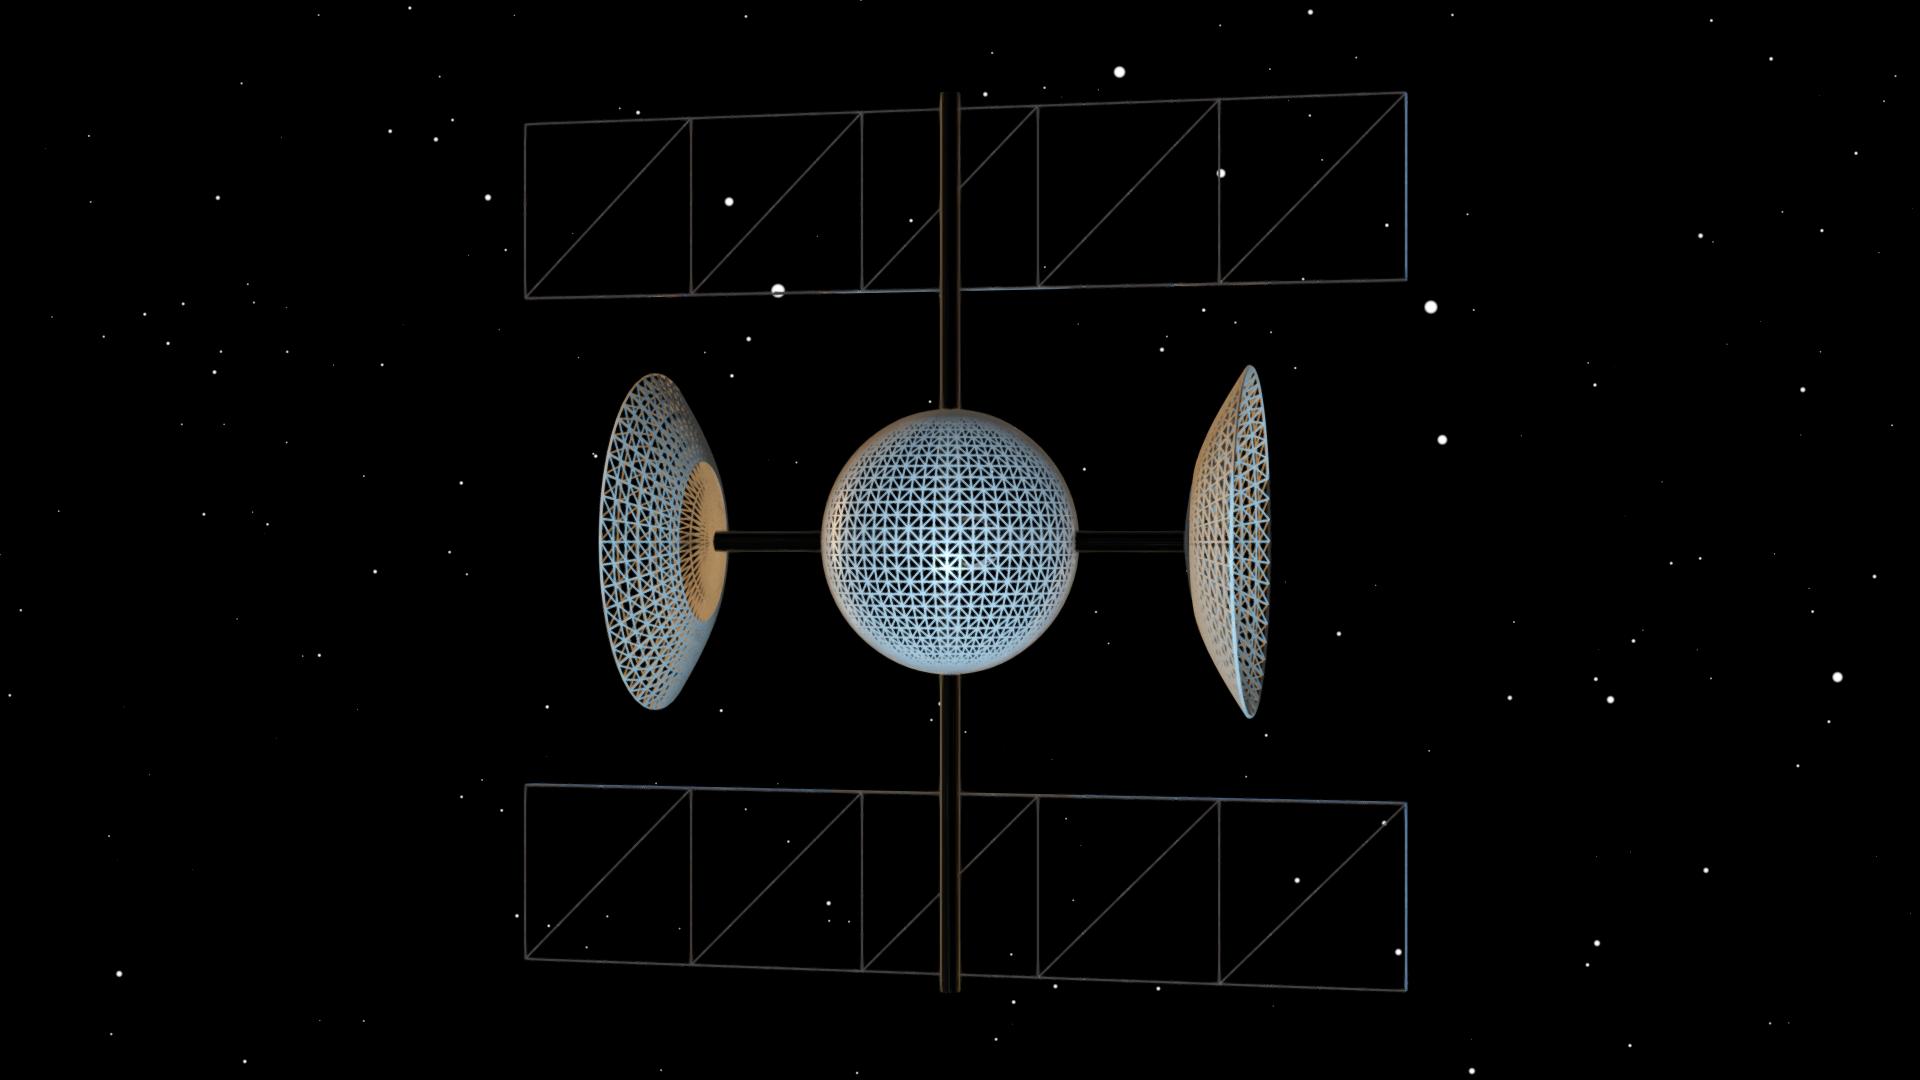 space probe models - photo #27